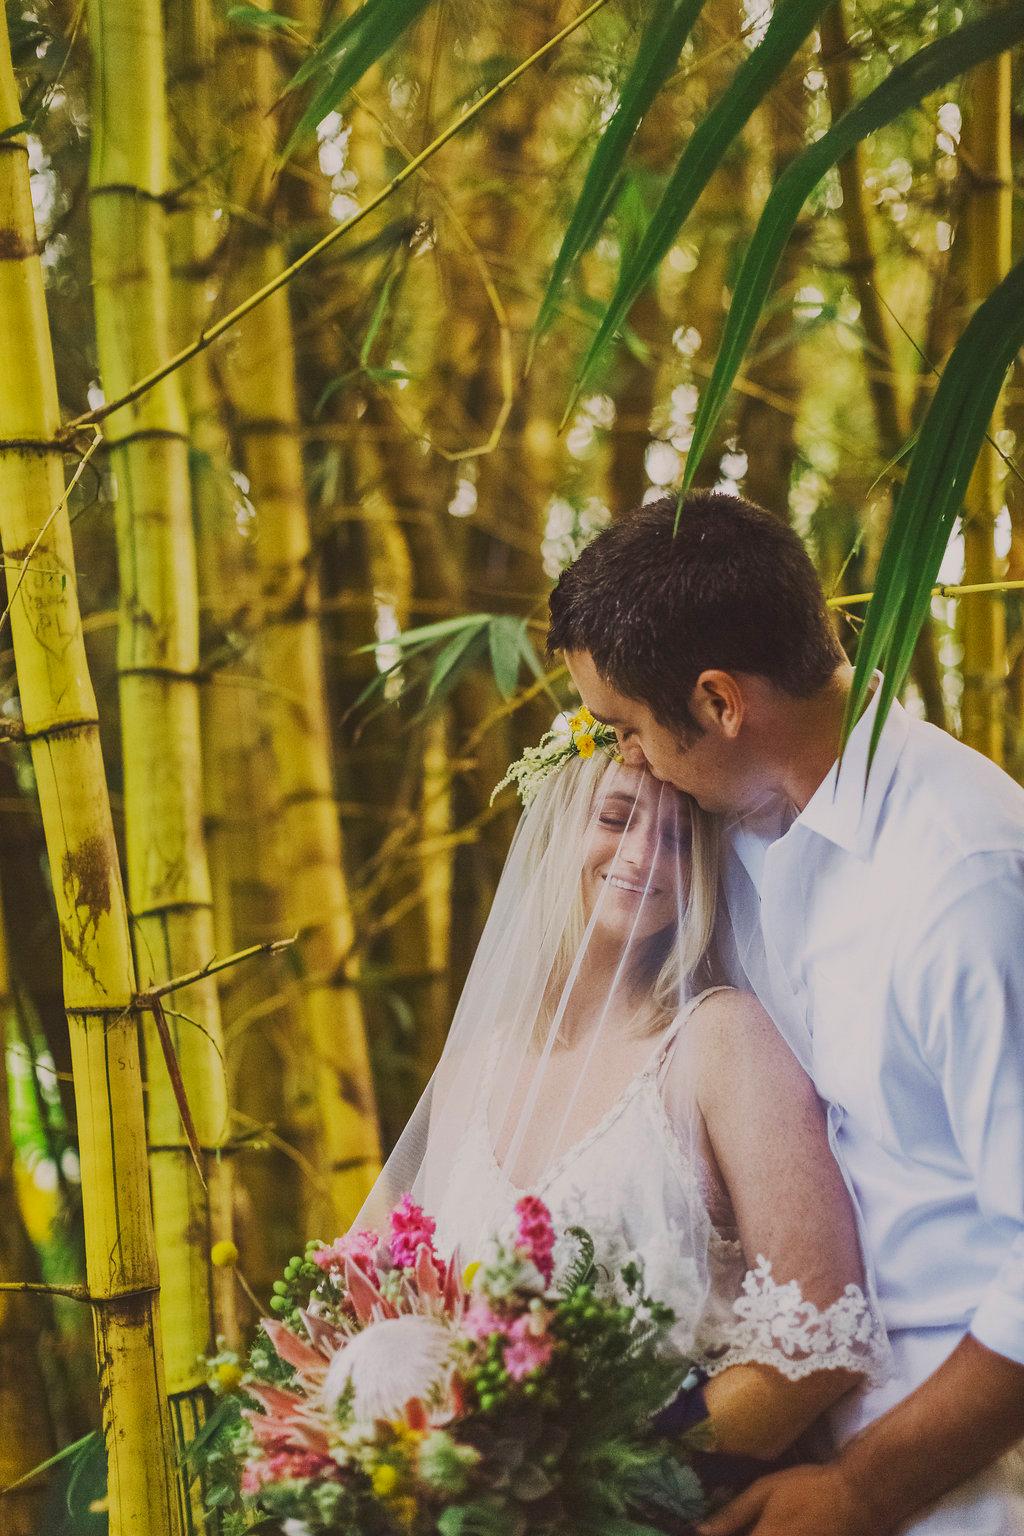 angie-diaz-photography-crisna-brandon-day-after-wedding-5.jpg